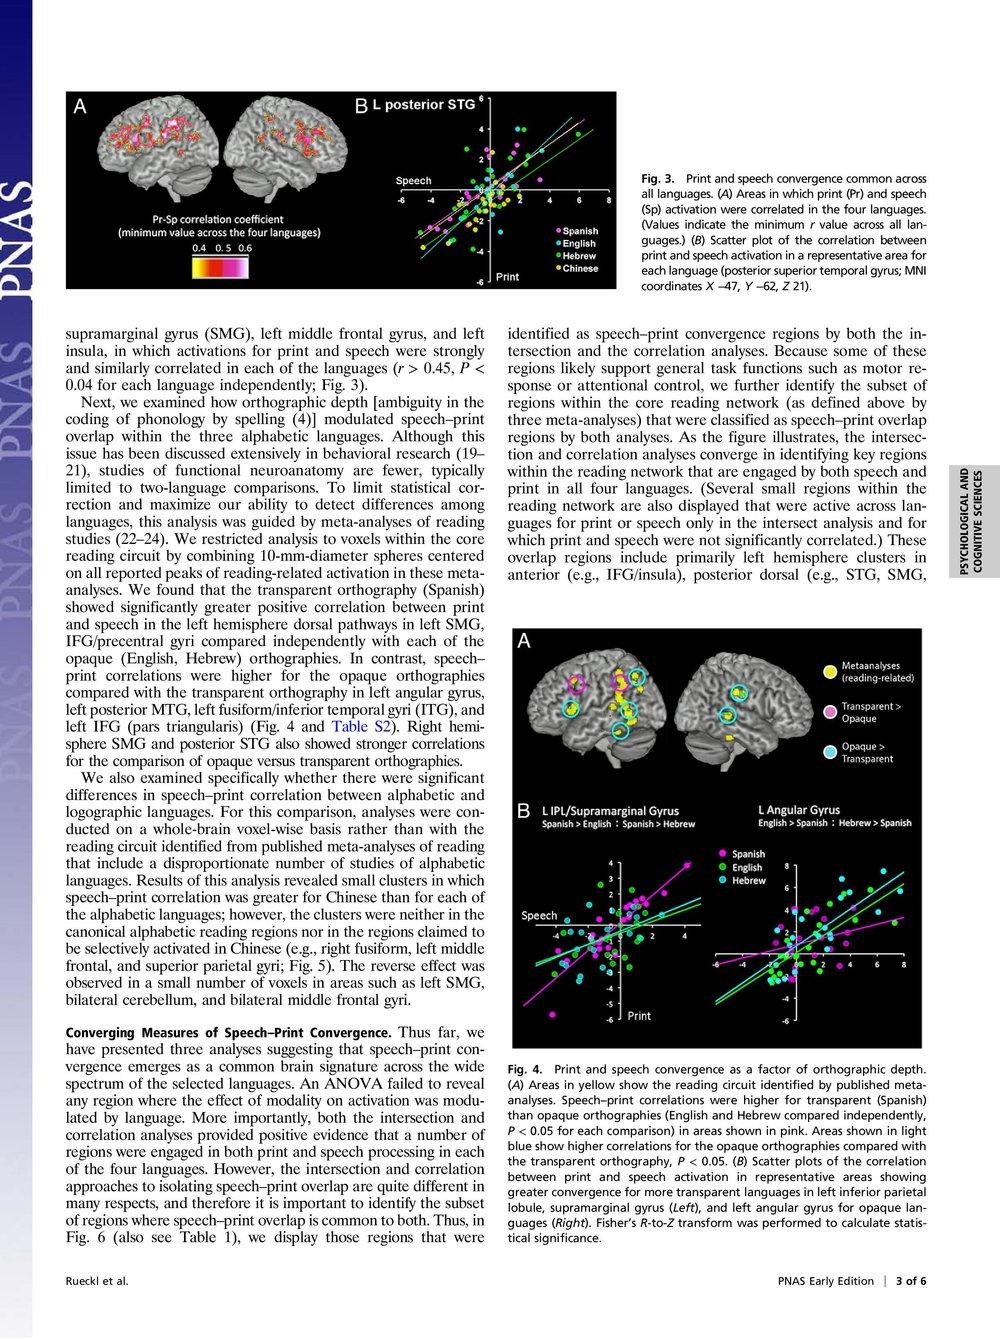 PNAS-2015-Rueckl-1509321112 (1)-page-003.jpg